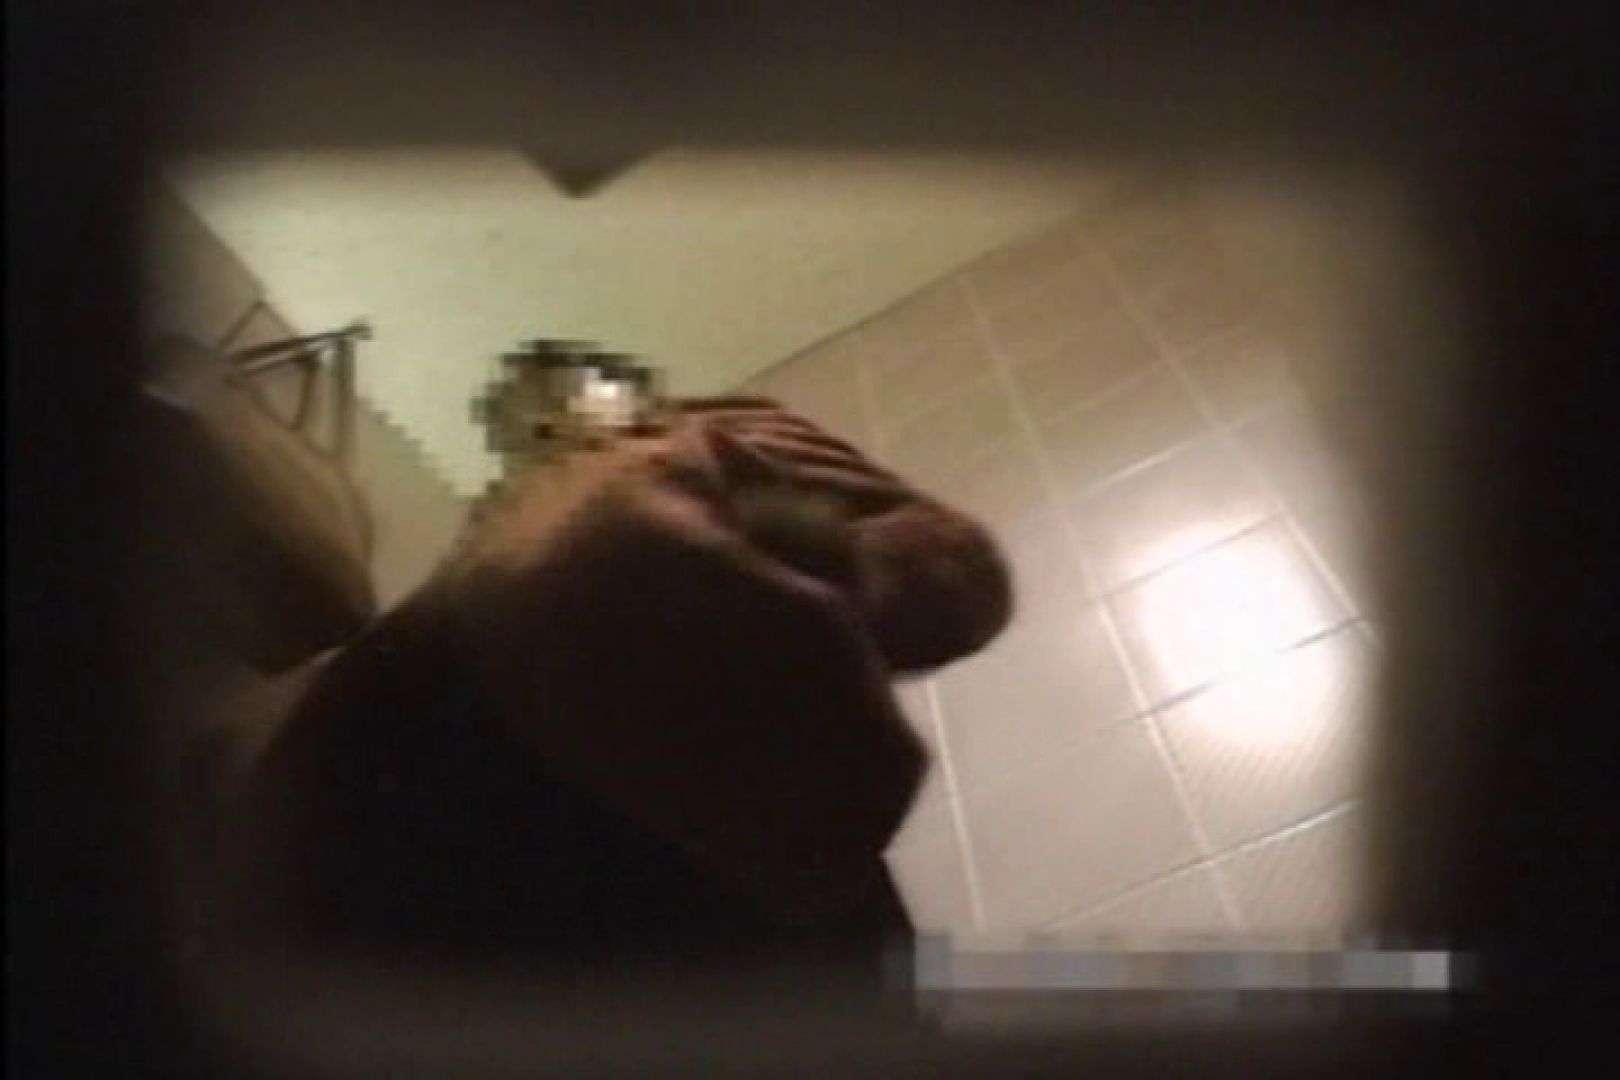 STY-013 実録!2カメde女子洗面所 洗面所 濡れ場動画紹介 90連発 11